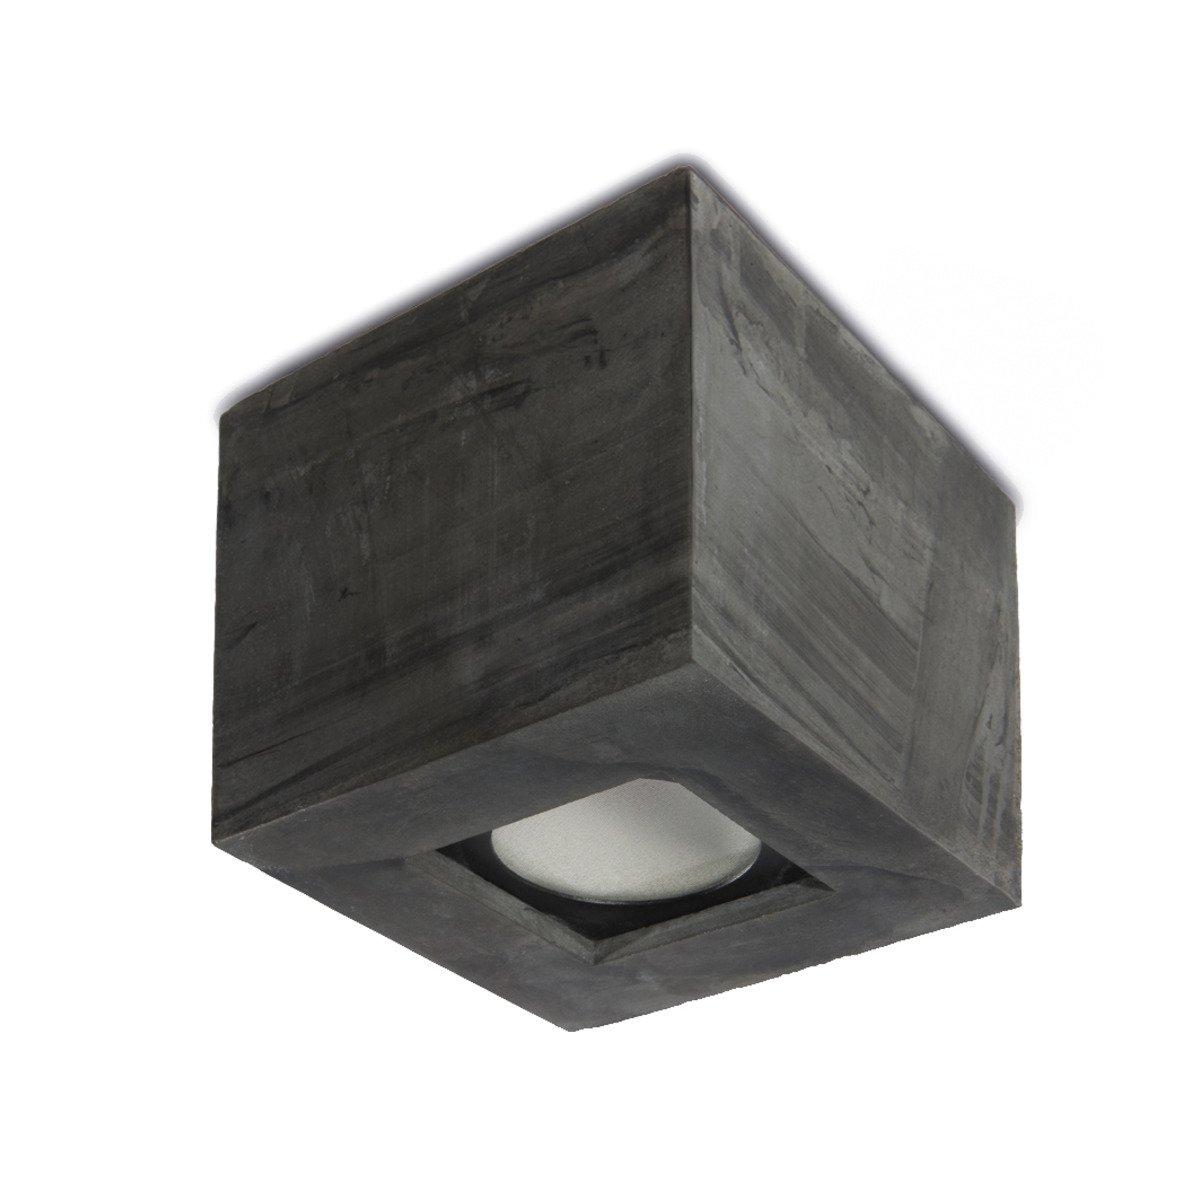 Concrete Collection Lighting - Bullard Bollards (5)